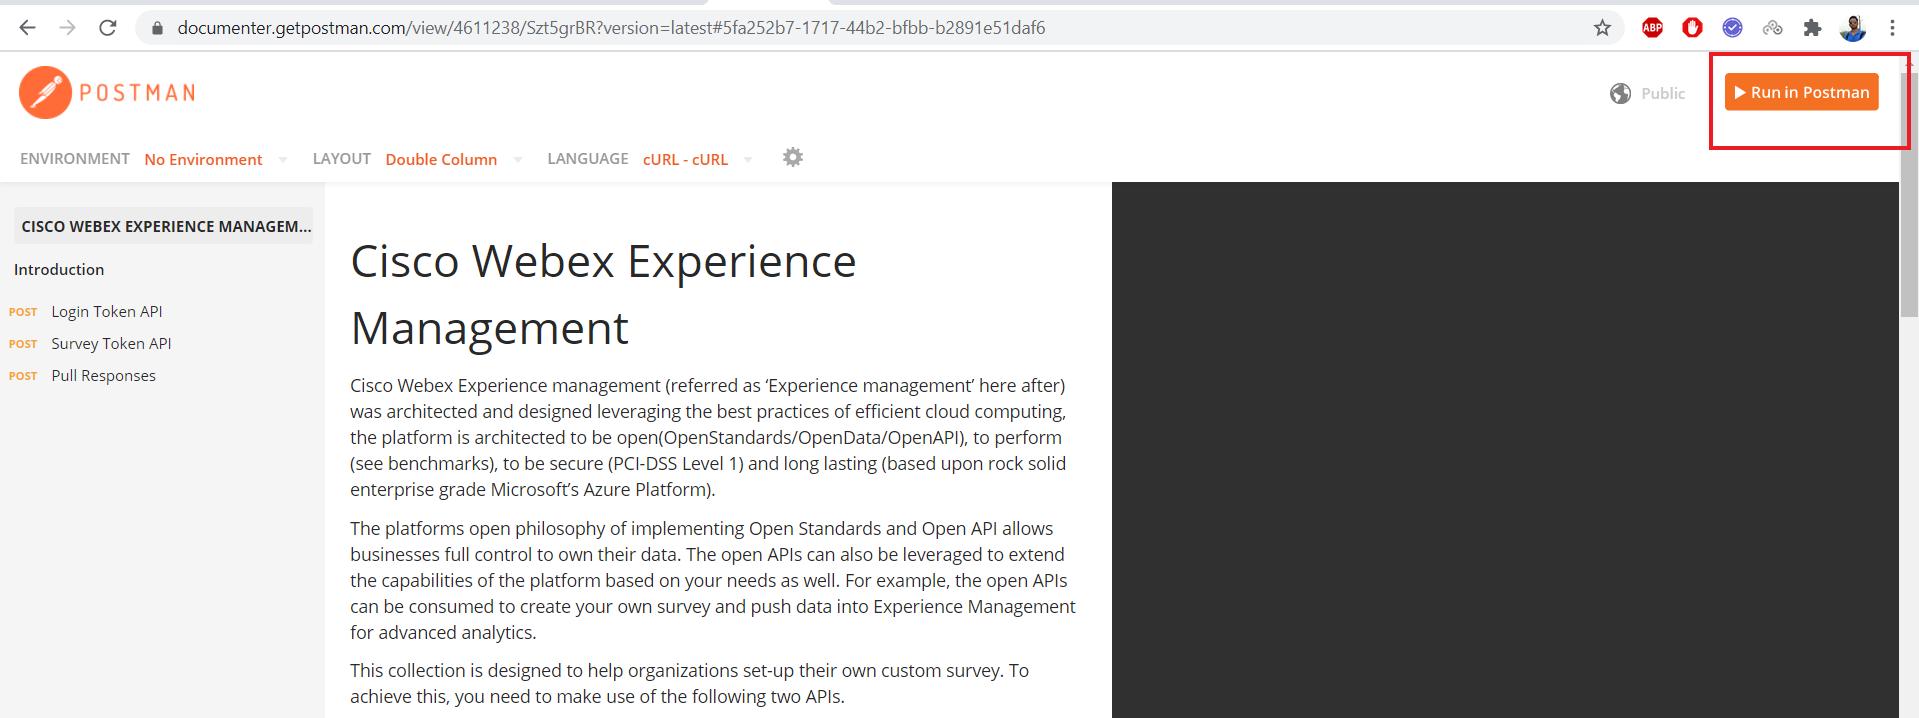 Integration-UseCase/realtimesurveytoken1.png